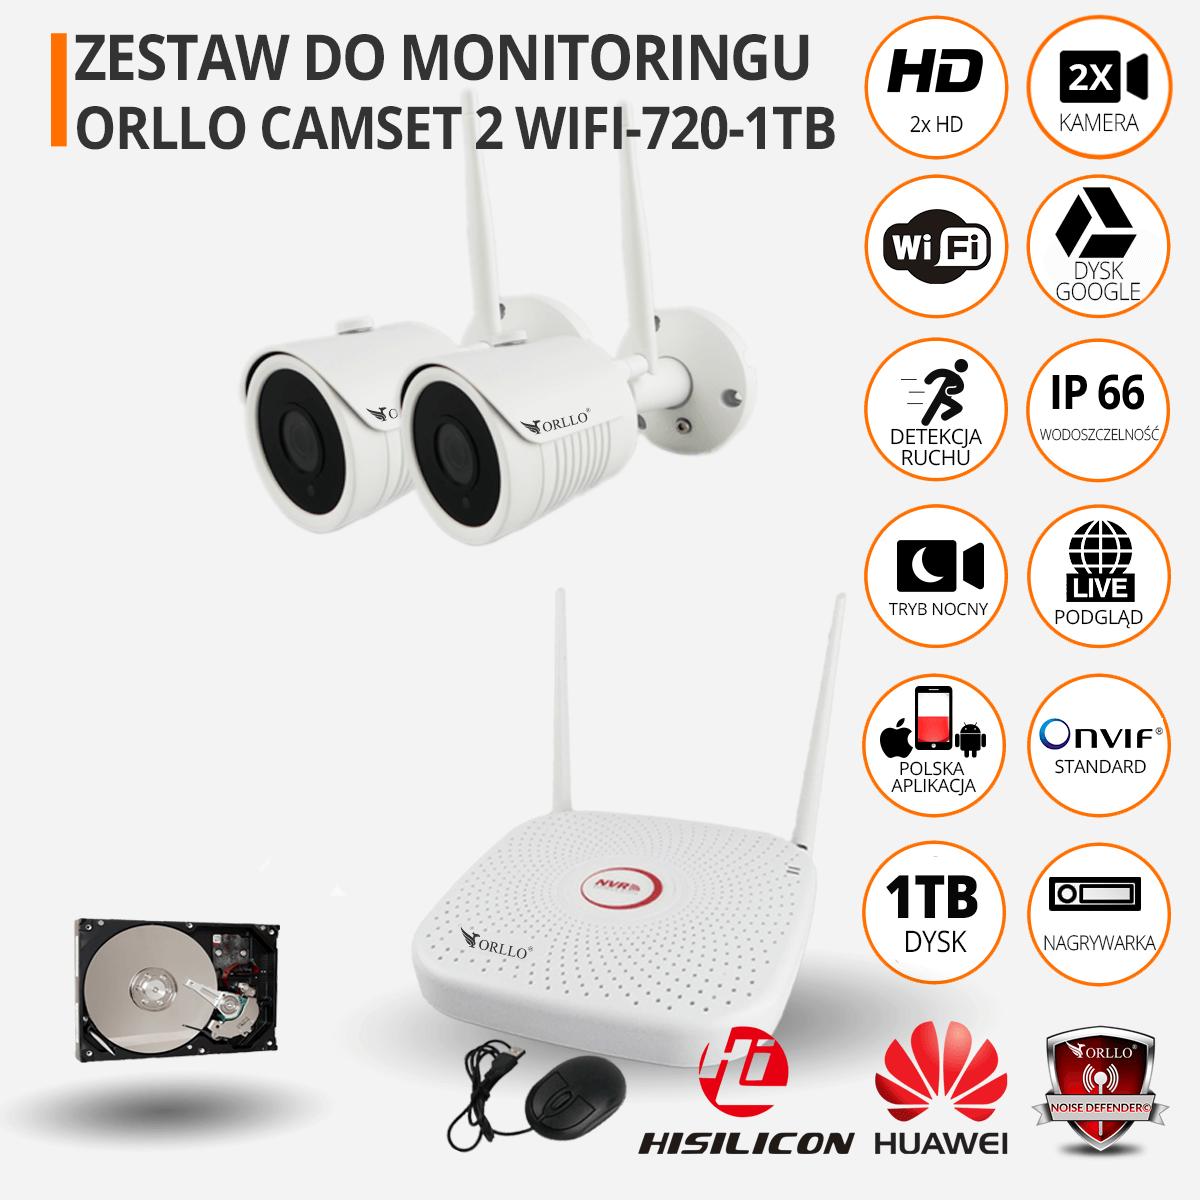 Zestaw do monitoringu CAMSET 2 720 funkcje orllo-pl